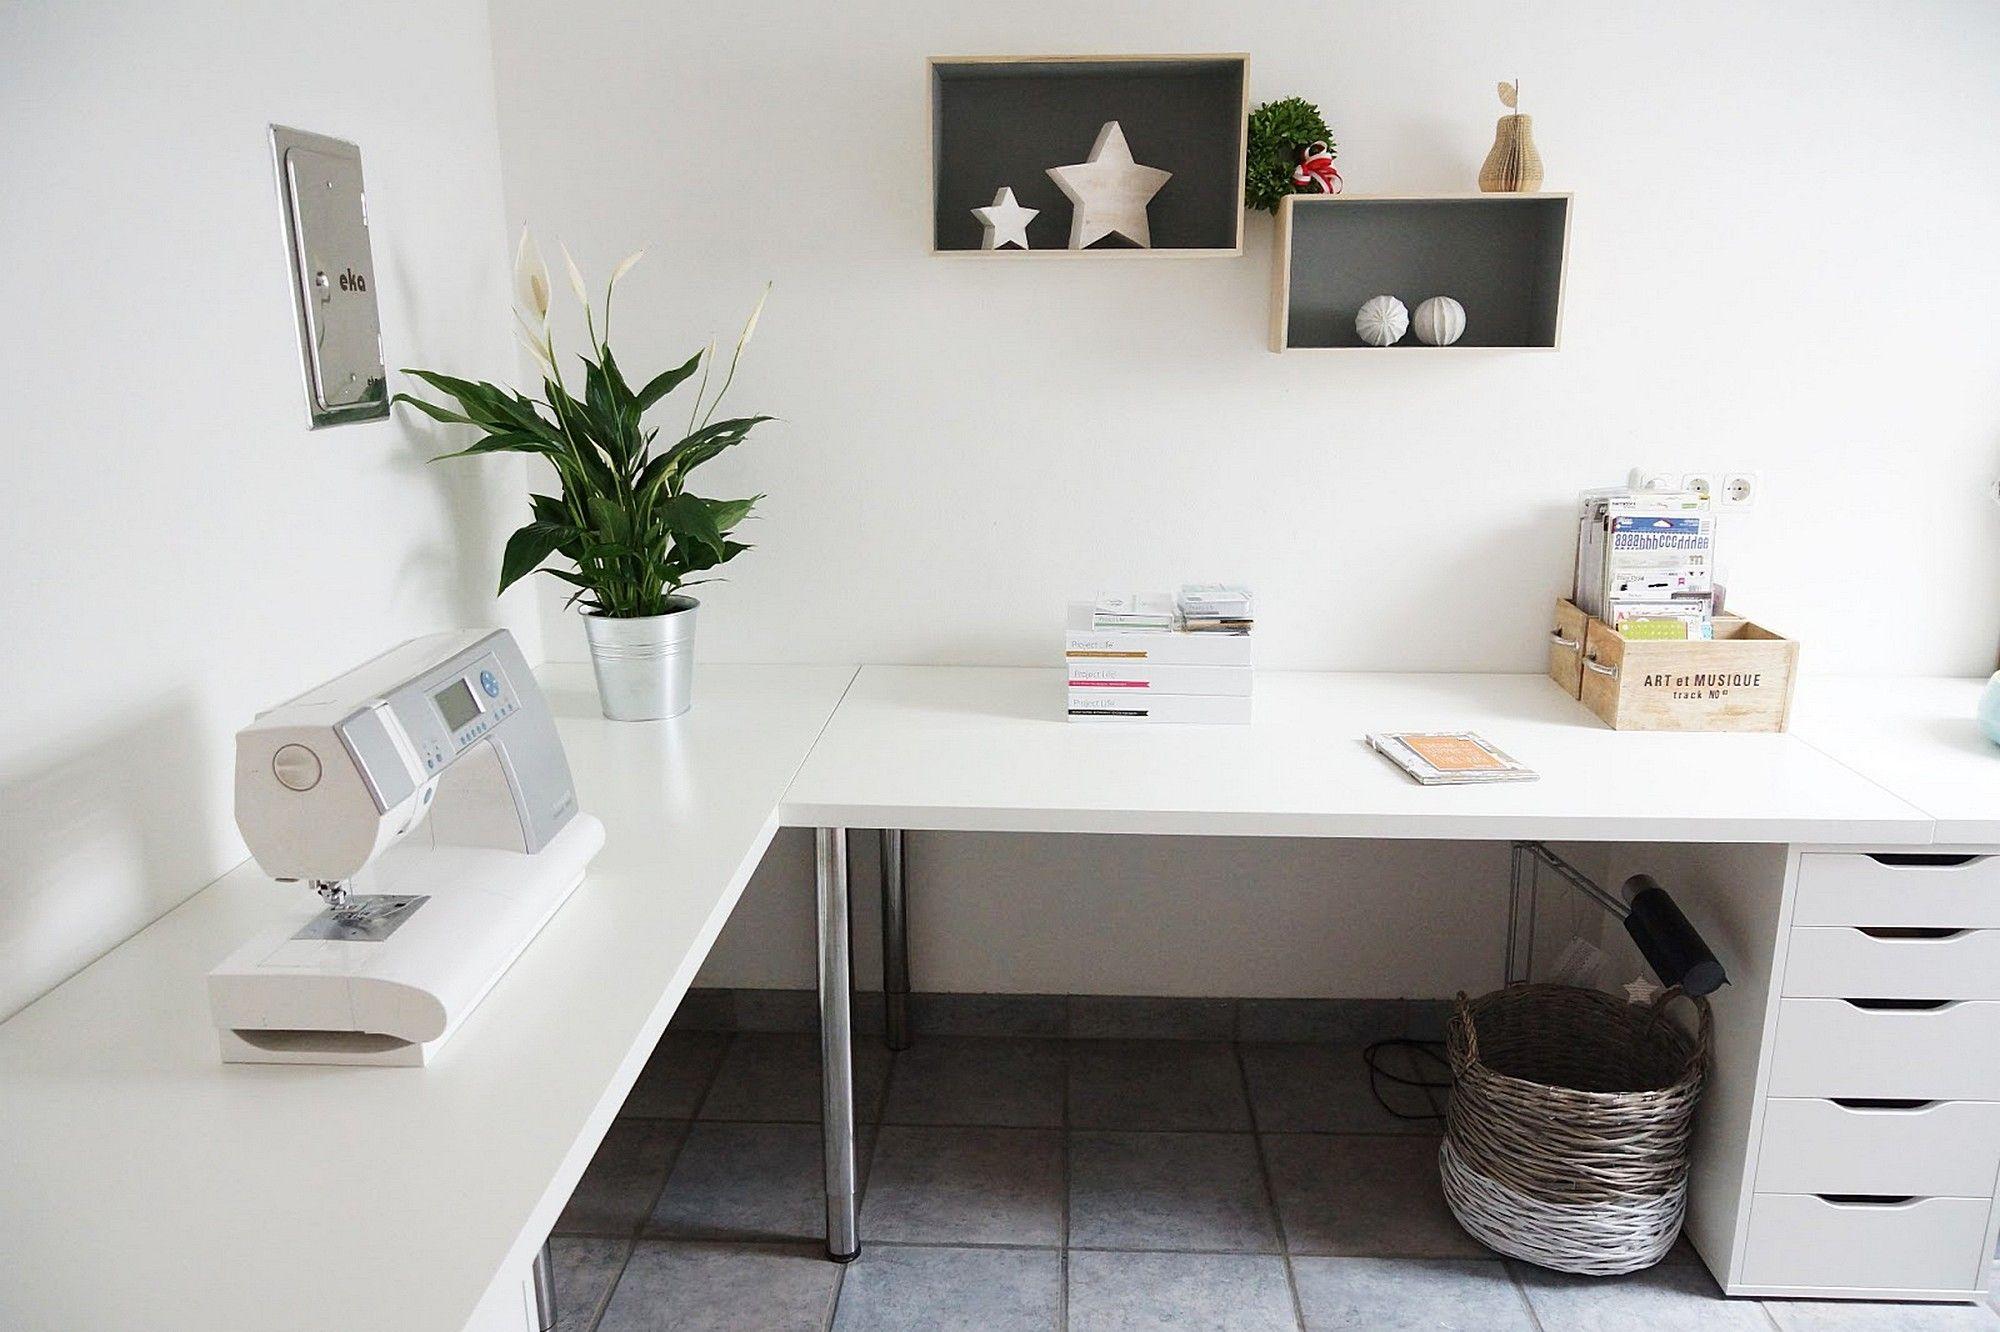 stunning diy corner desk designs inspire you accent table ikea cornerdeskplansfree bath and beyond salt lamp outside grill himym umbrella west elm terrace coffee outdoor farmhouse